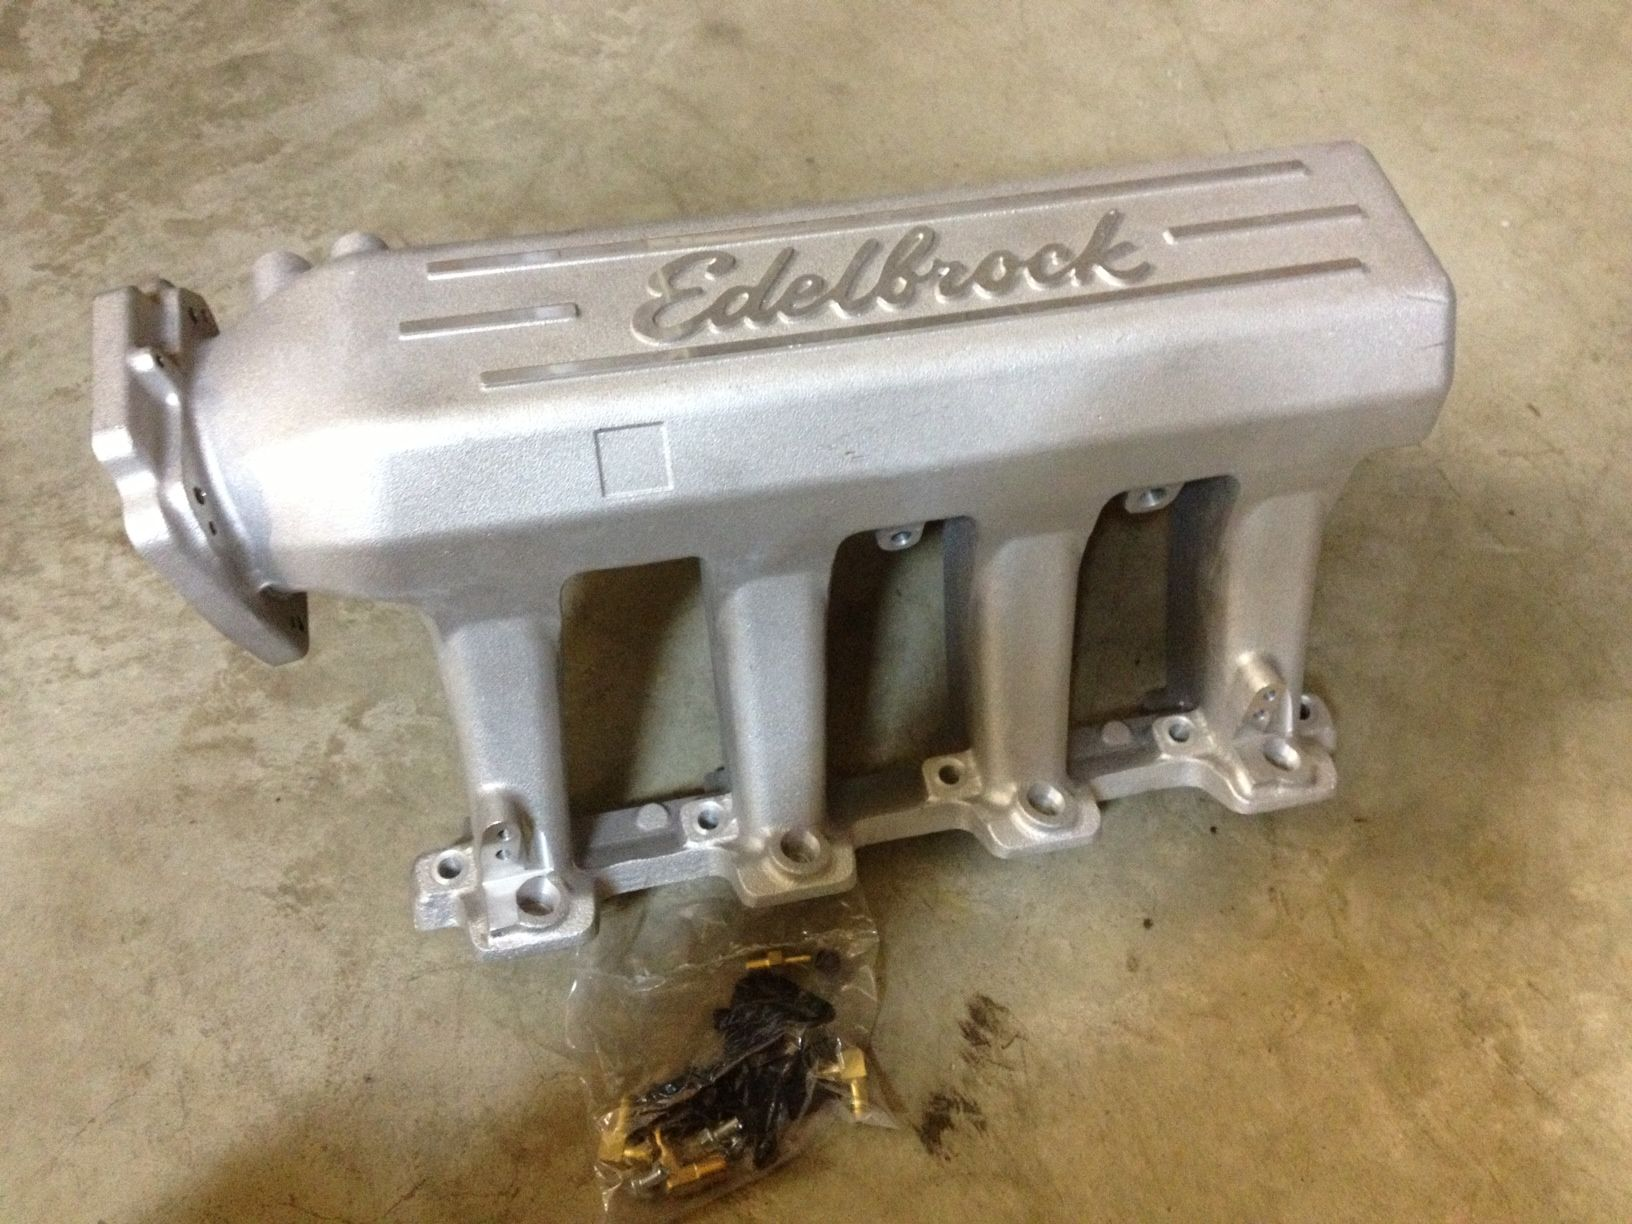 Edelbrock pro-flo xt intake manifold and stock LS1 throttle